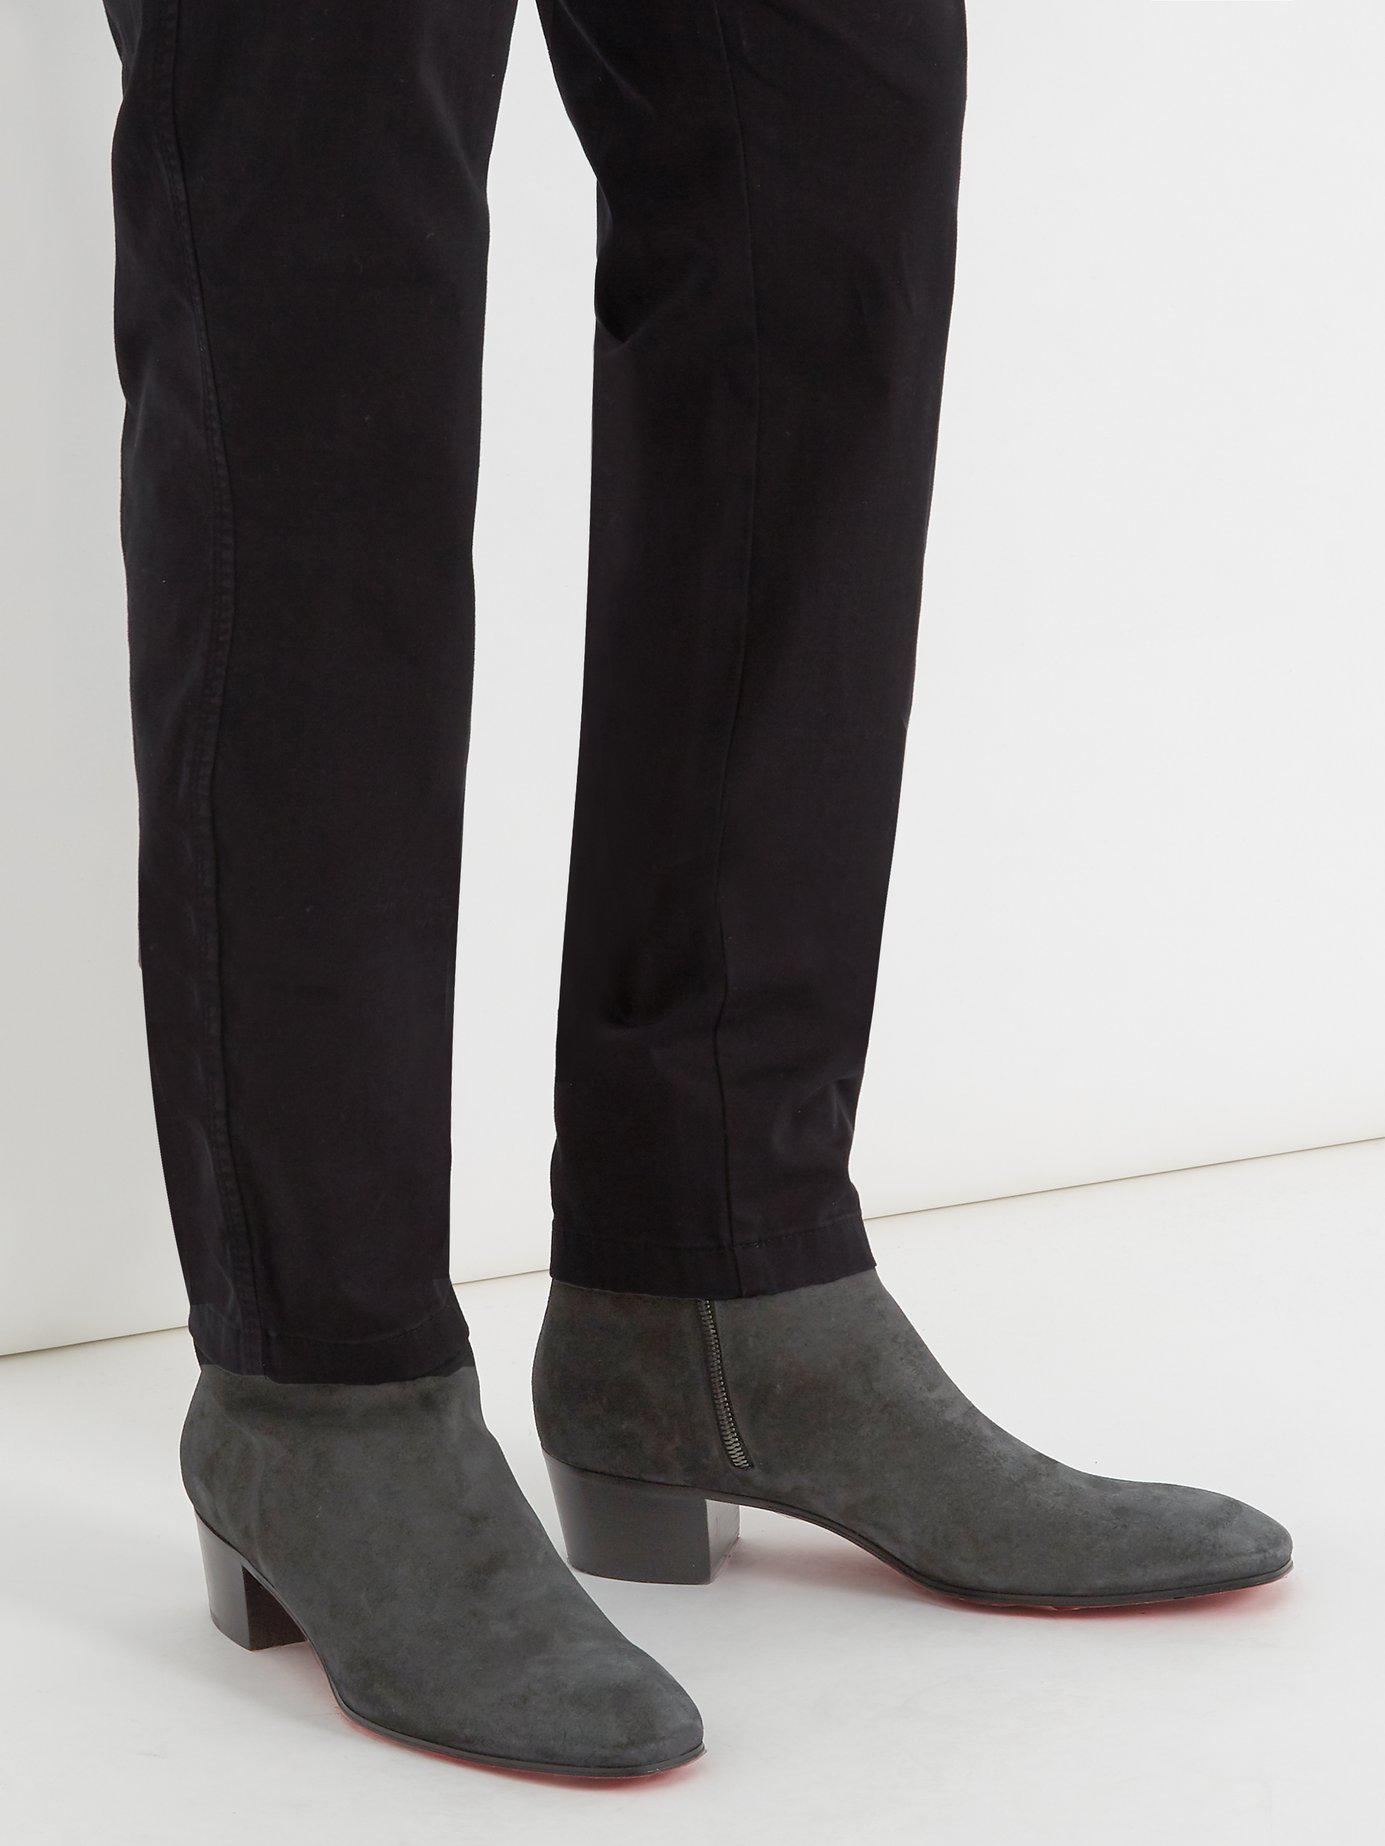 394218e4585 Men's Black Huston Suede Ankle Boots